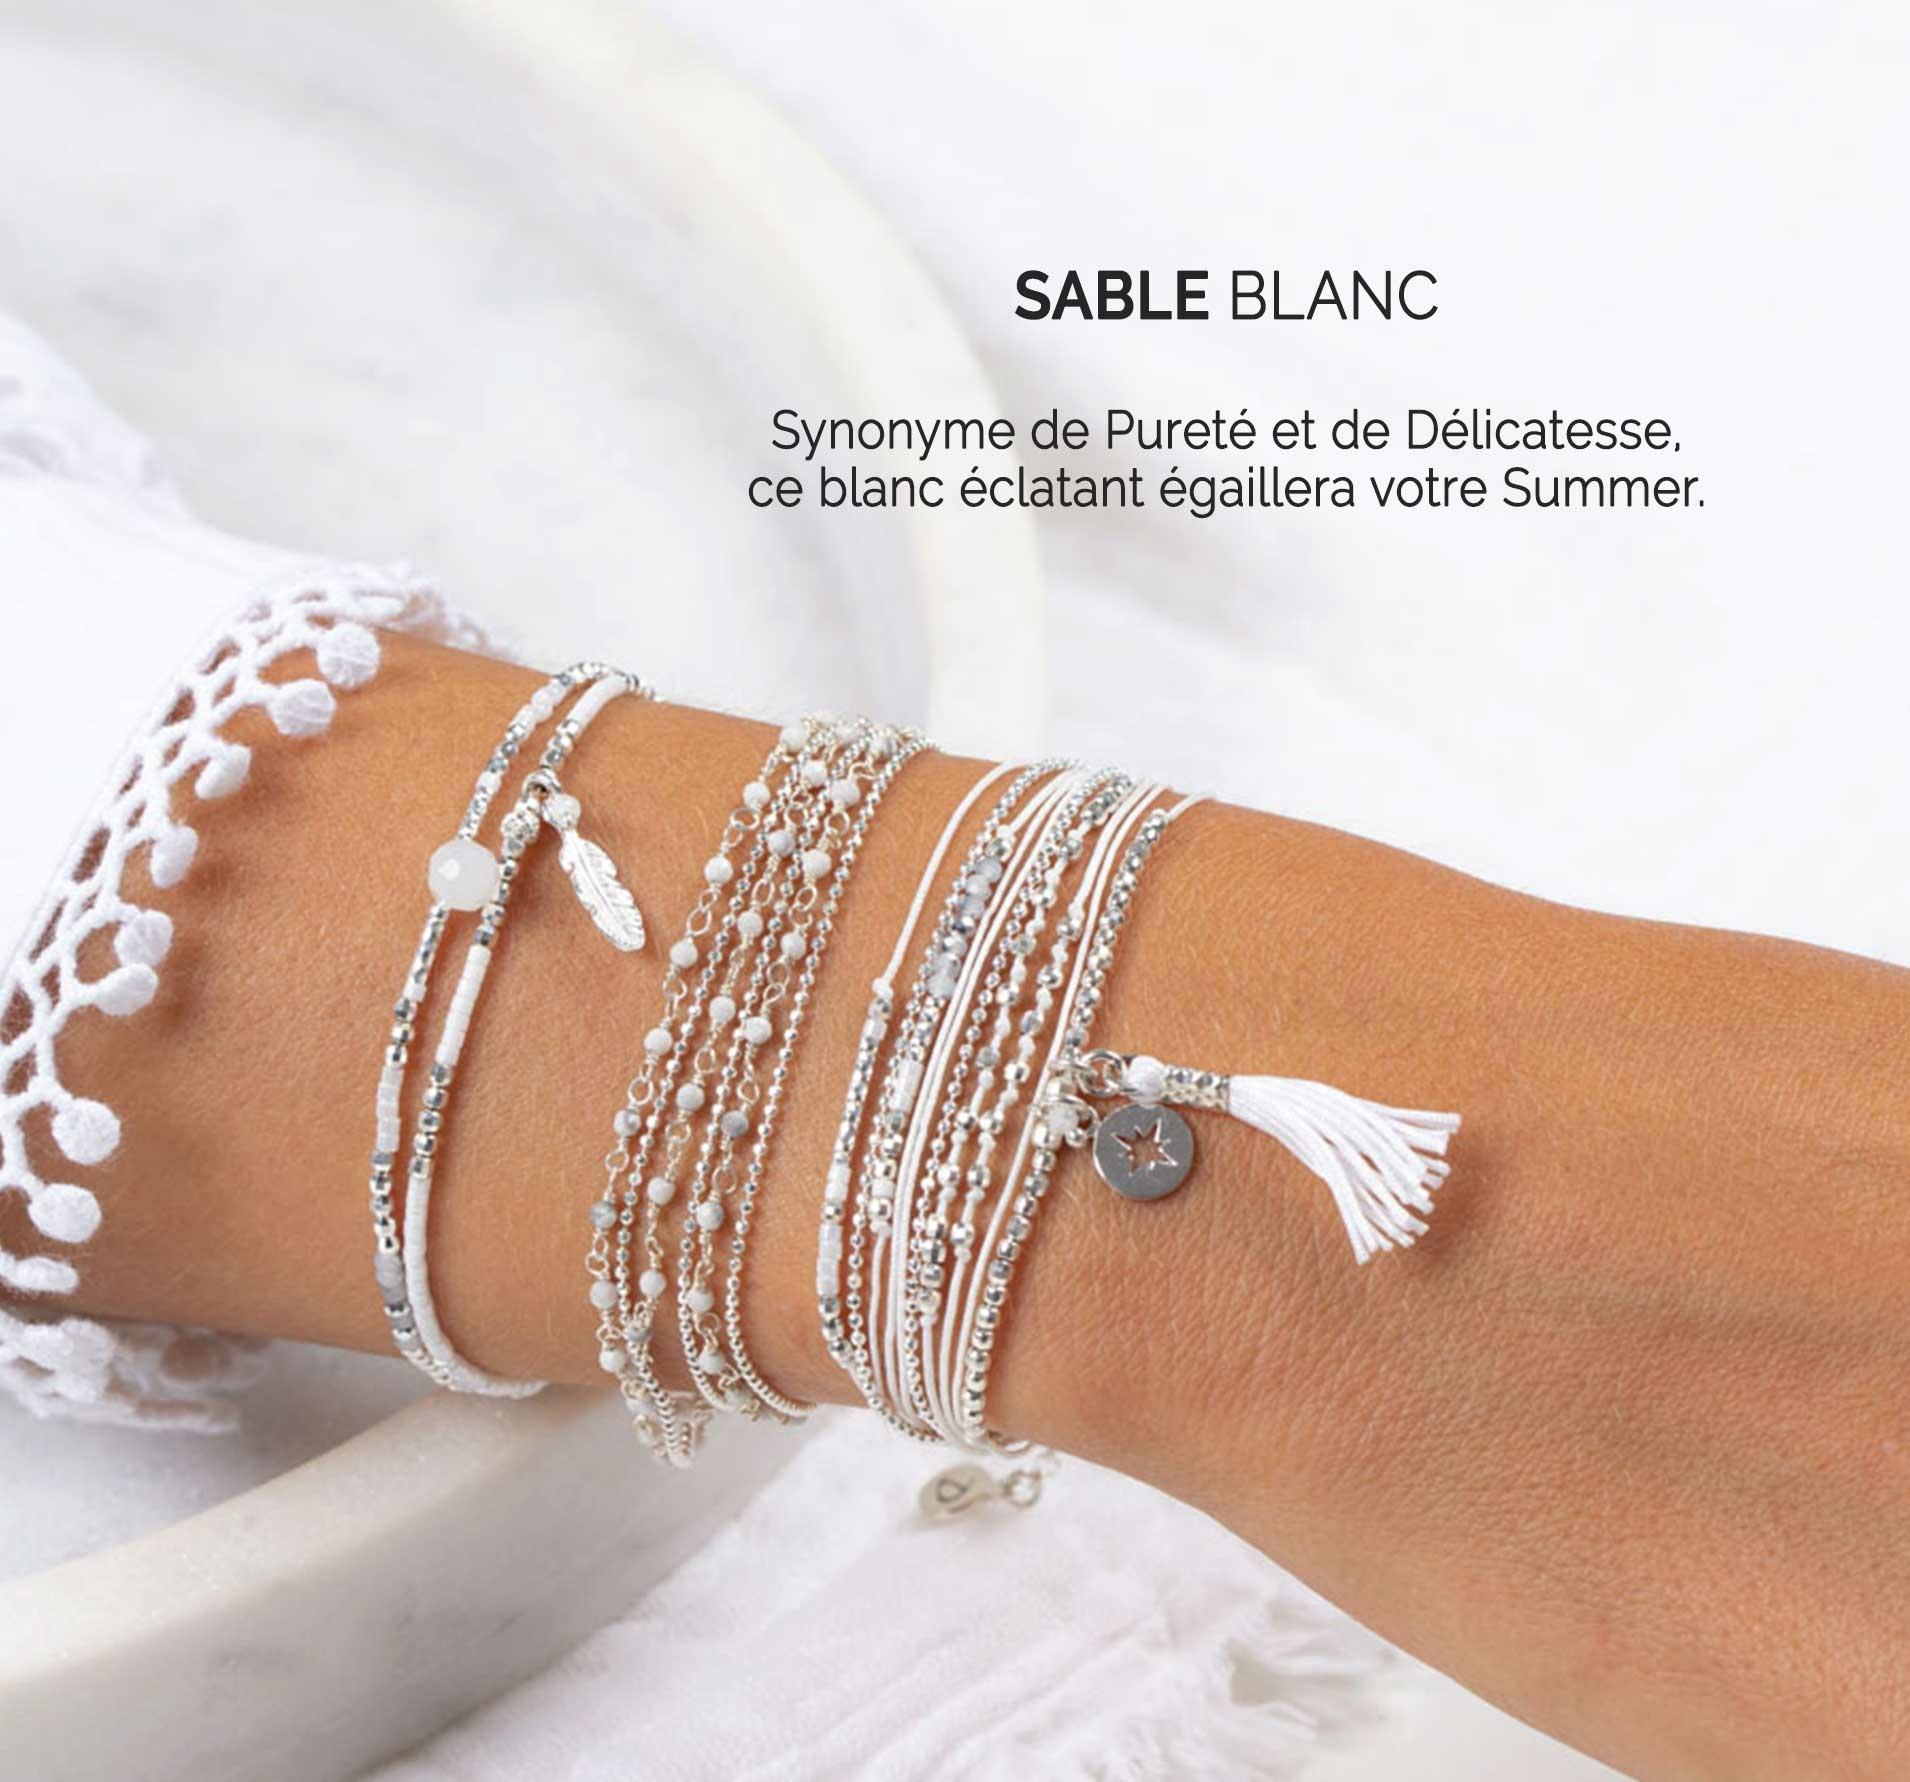 Bandeau-Sable-Blanc